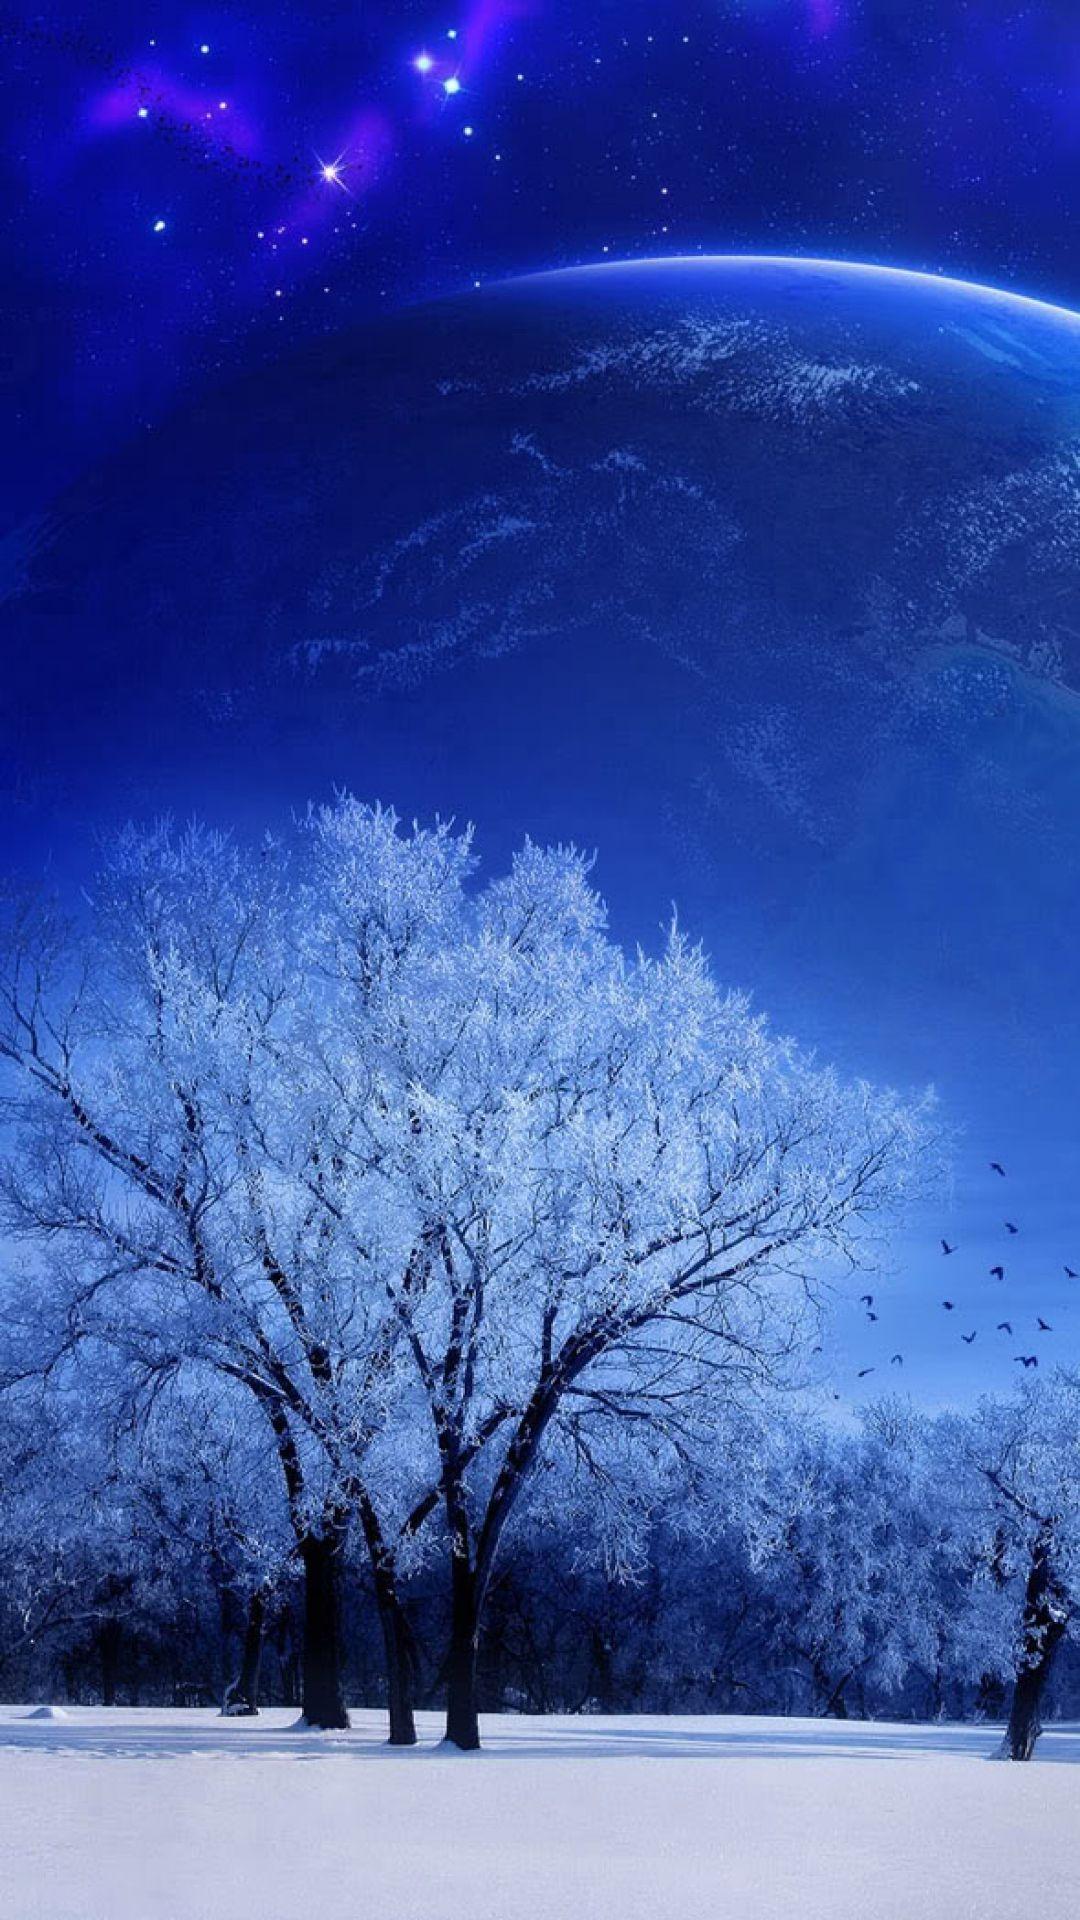 Nature Landscape Winter Sky Snow Full Moon Trees Birds Evening Beautiful Landscapes Winter Landscape Nature